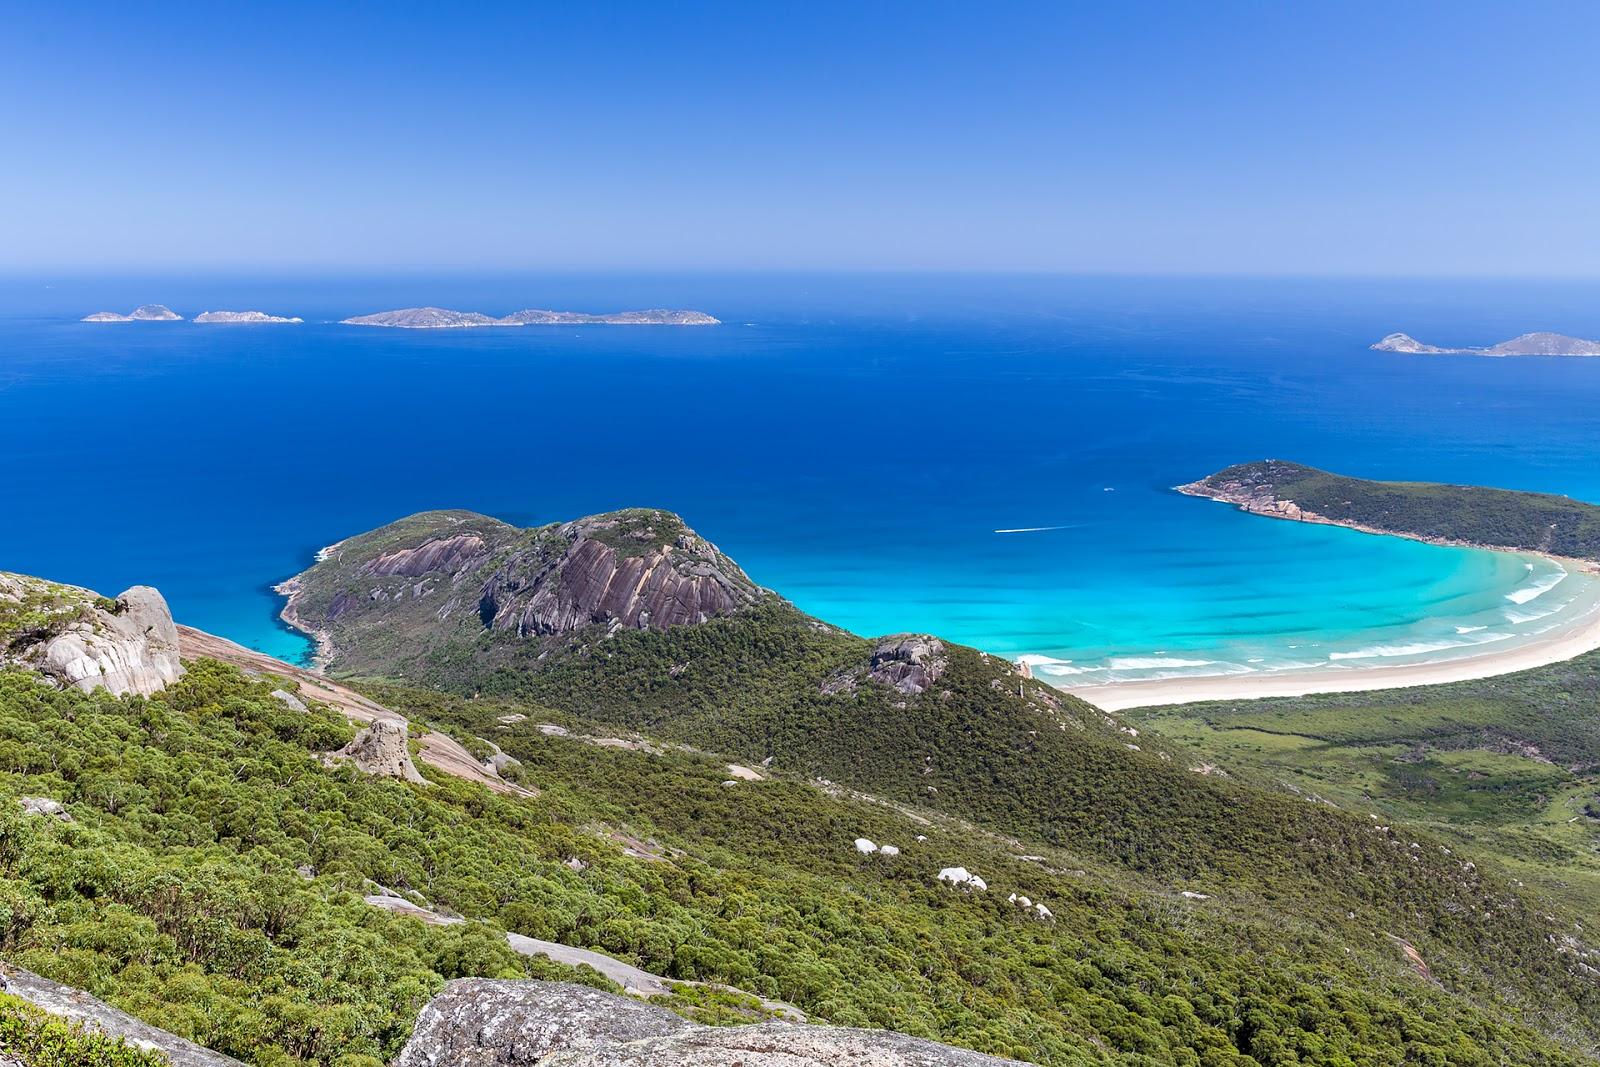 Australia-Wilsons Promontory